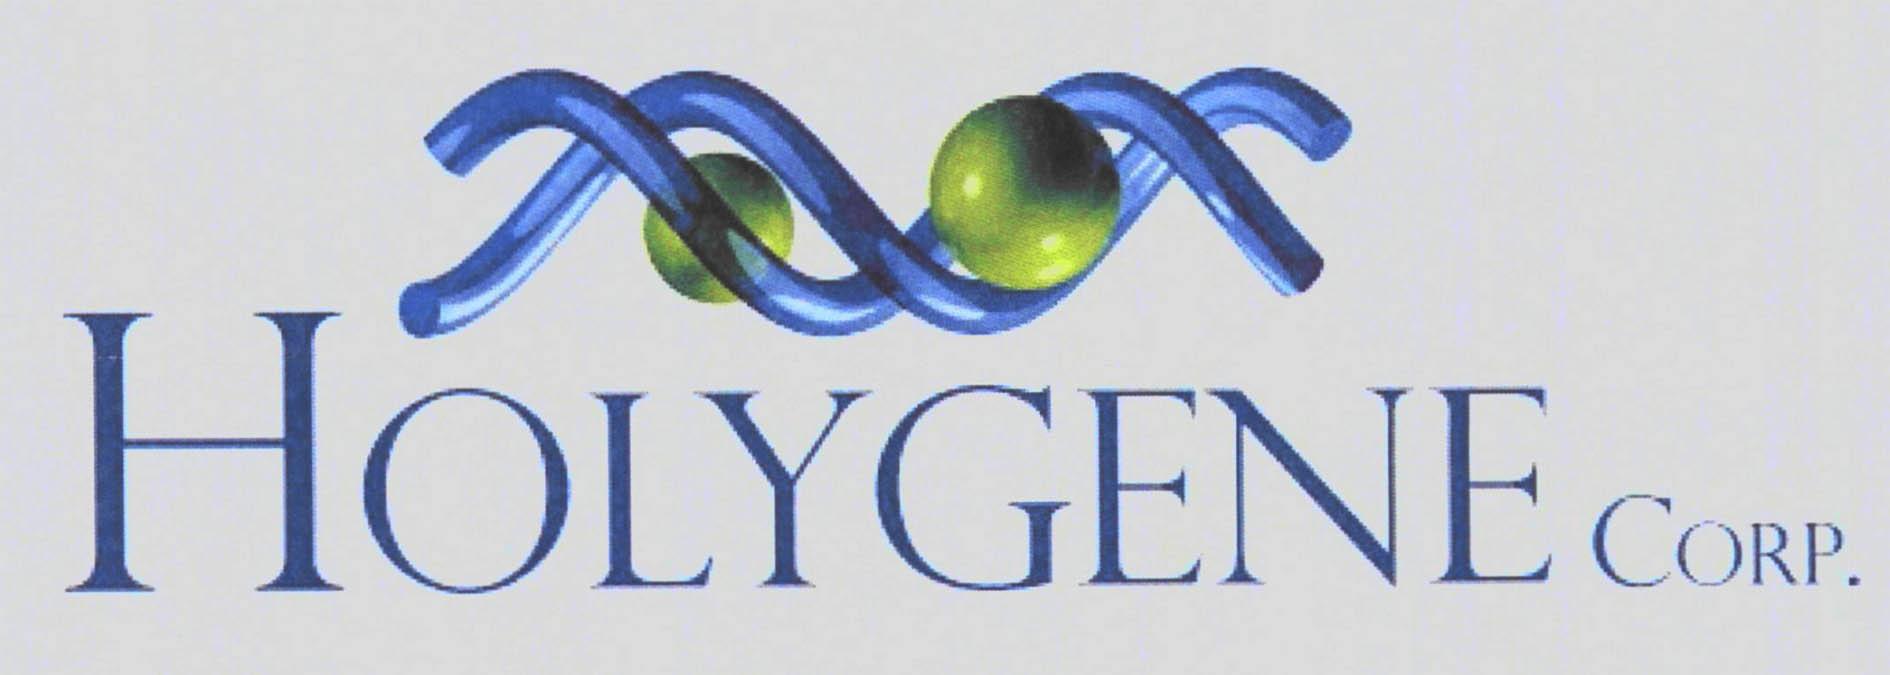 holygene corp. - reviews & brand information - holygene